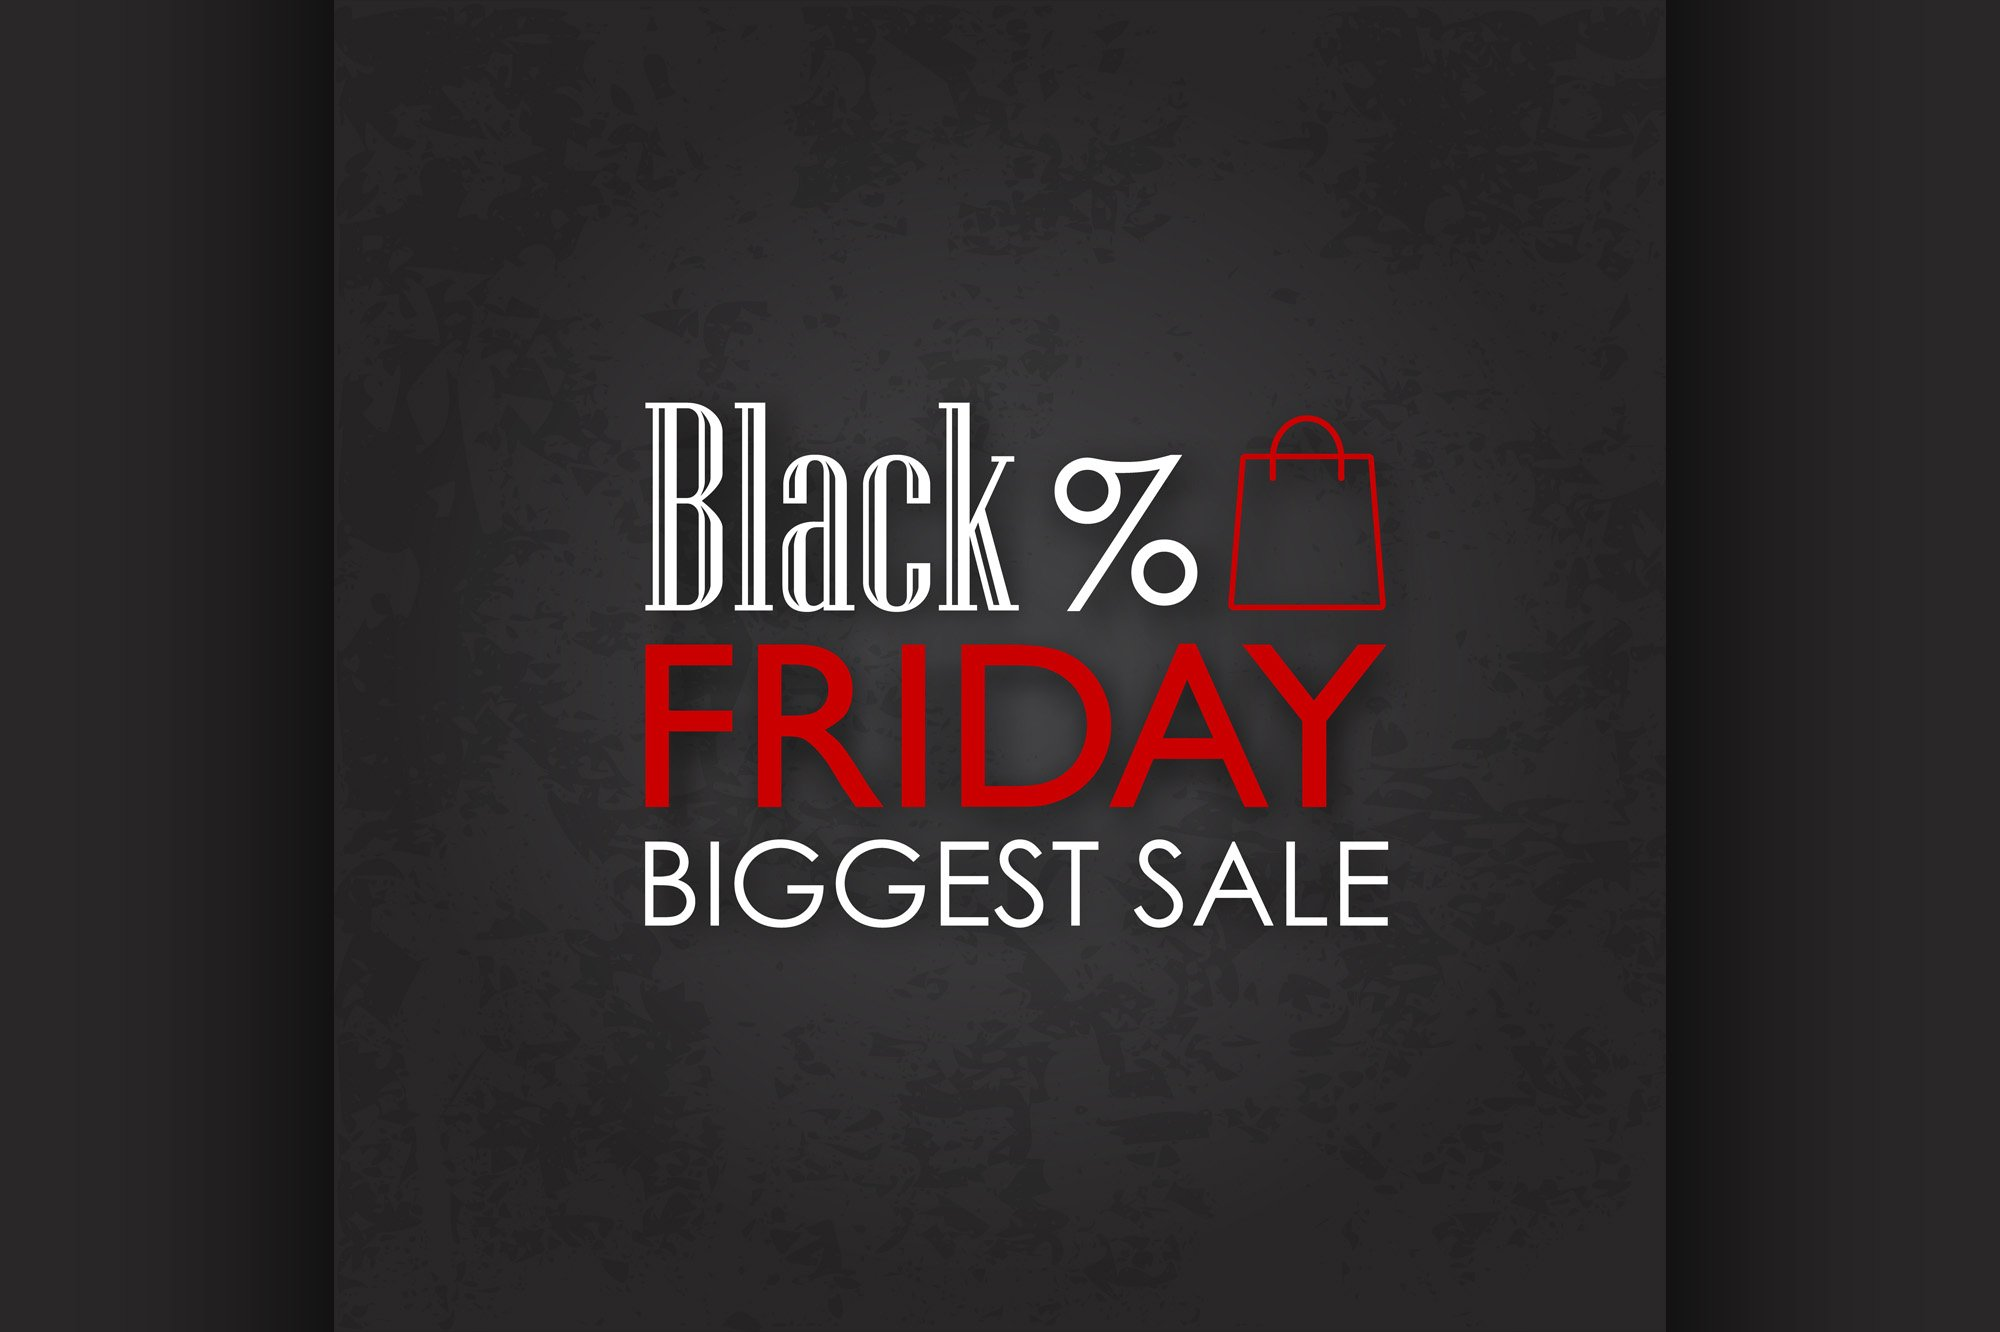 Black Friday Sale Calligraphic Designs example image 1